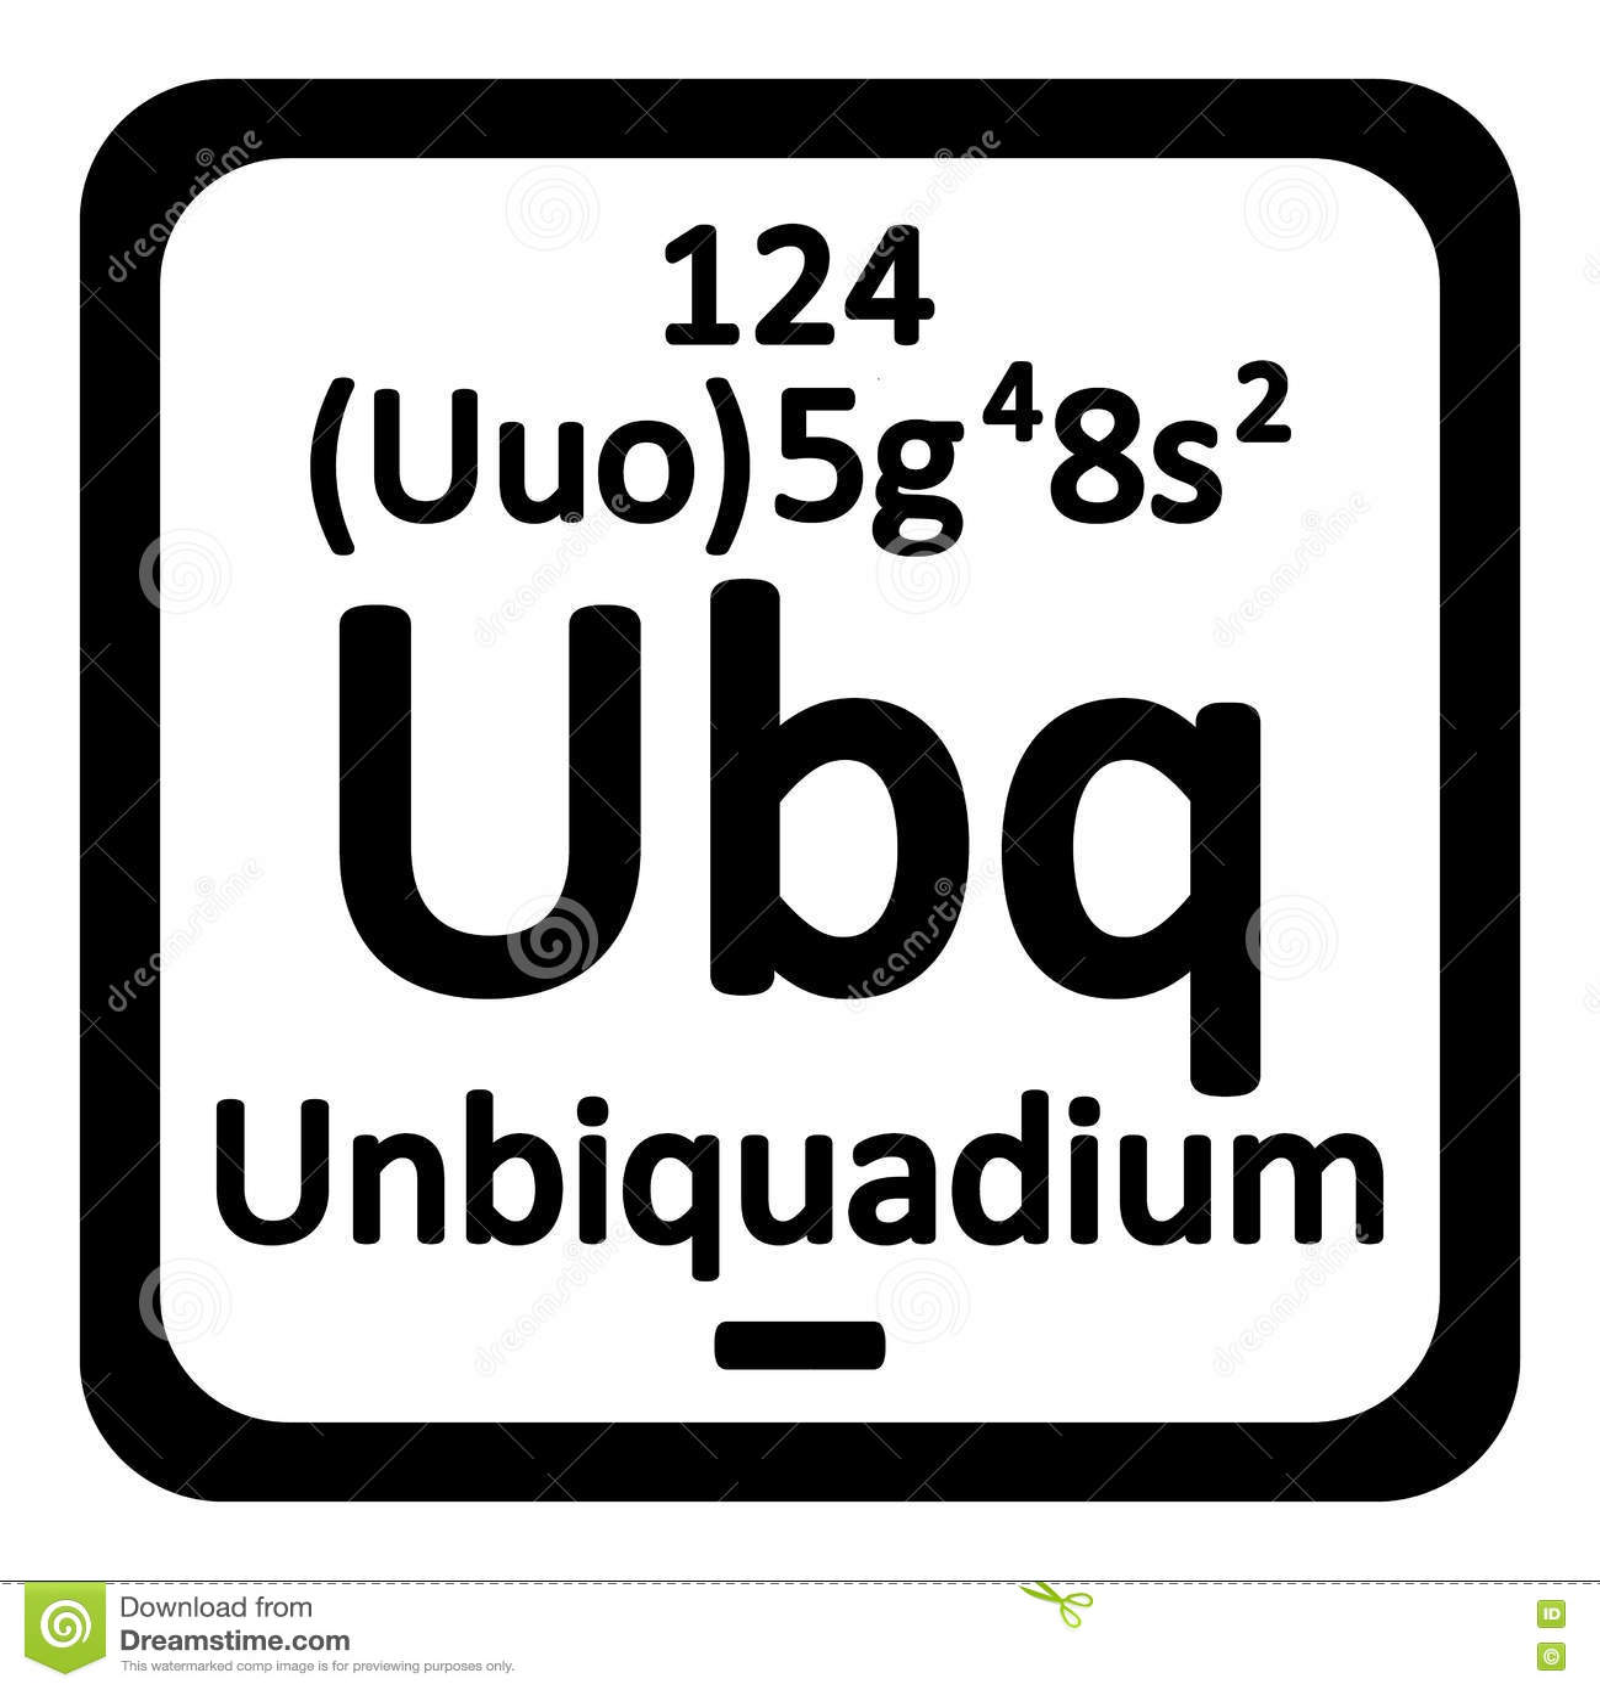 Periodic table element unbiquadium icon stock illustration royalty free illustration download periodic table gamestrikefo Choice Image